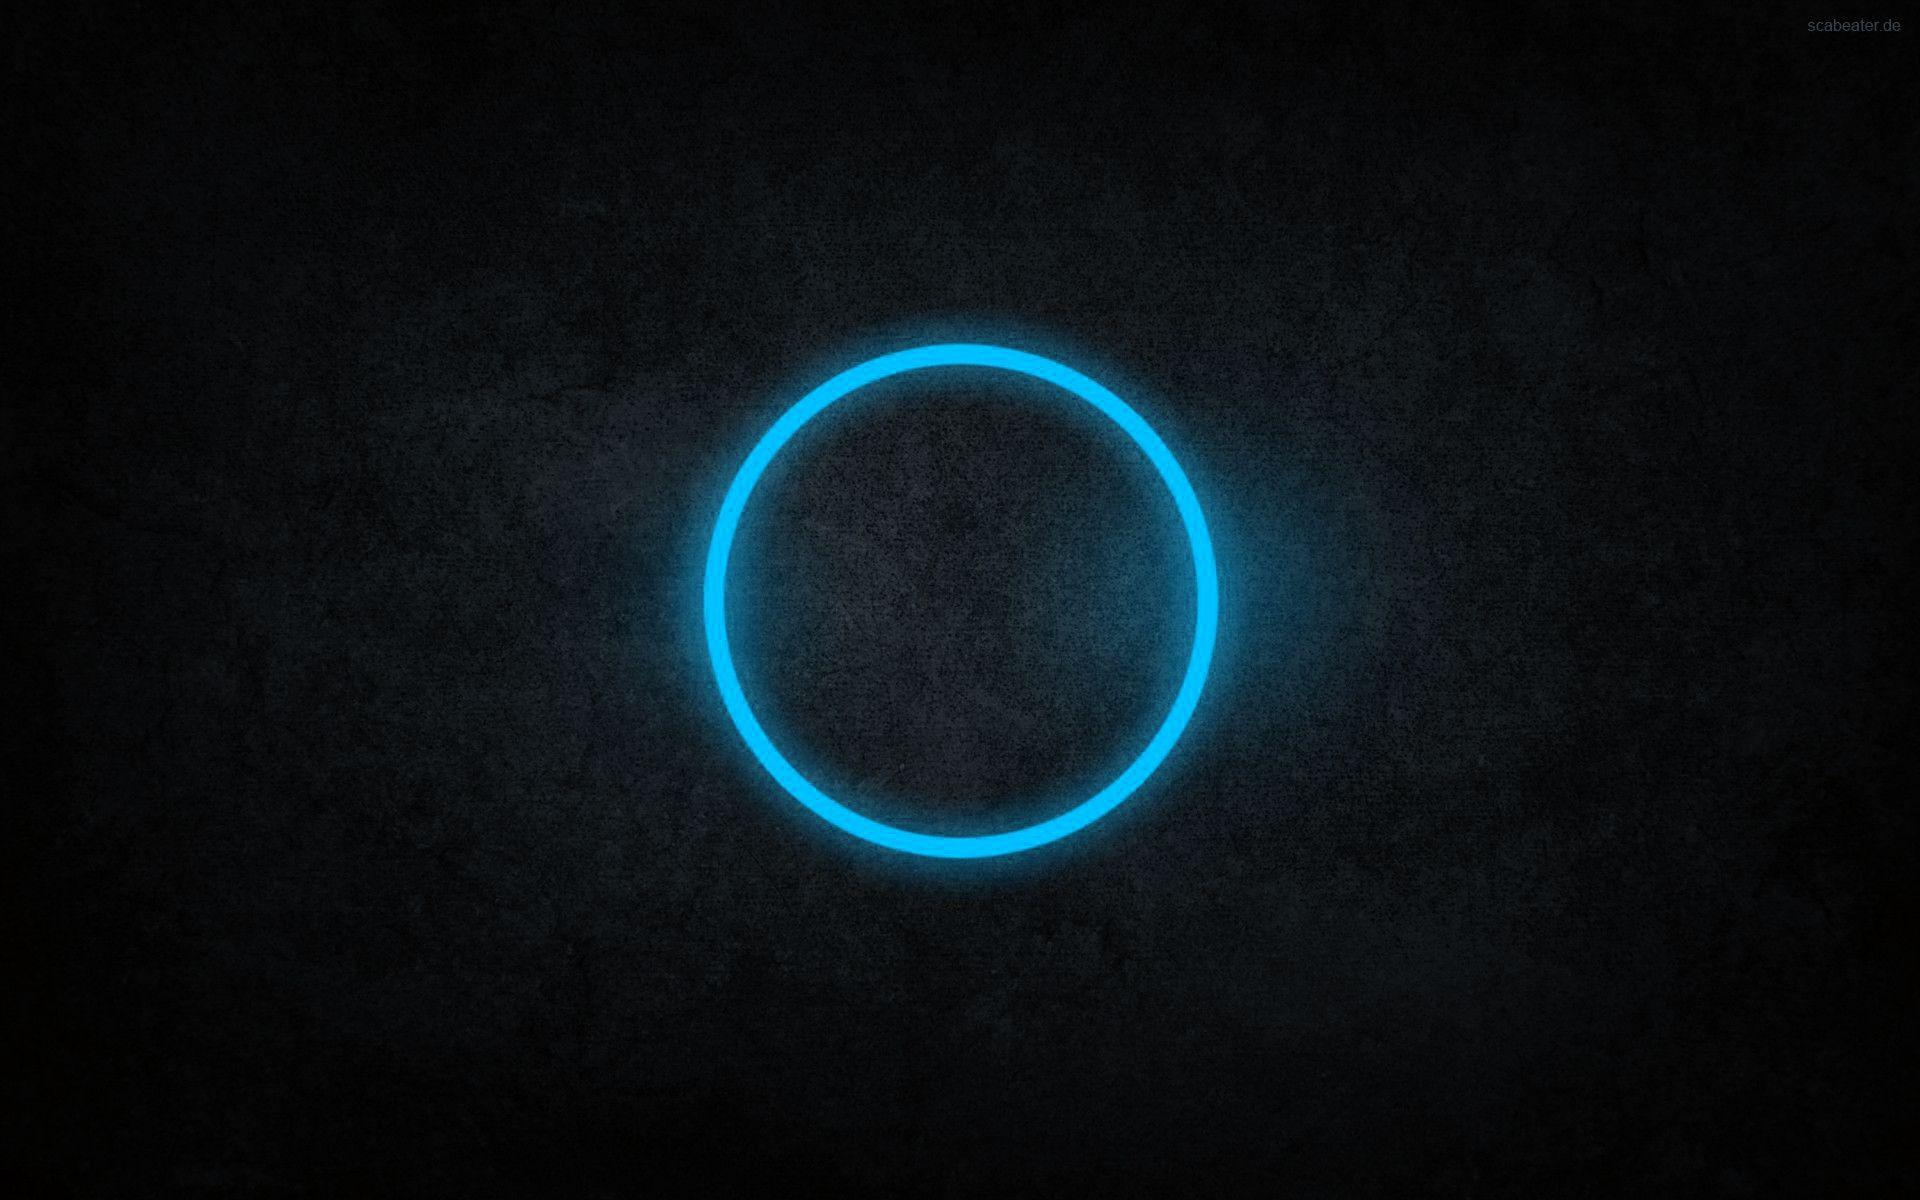 Abstract Blue Black Dark Circles Rings Cyan Neon Art Wallpaper